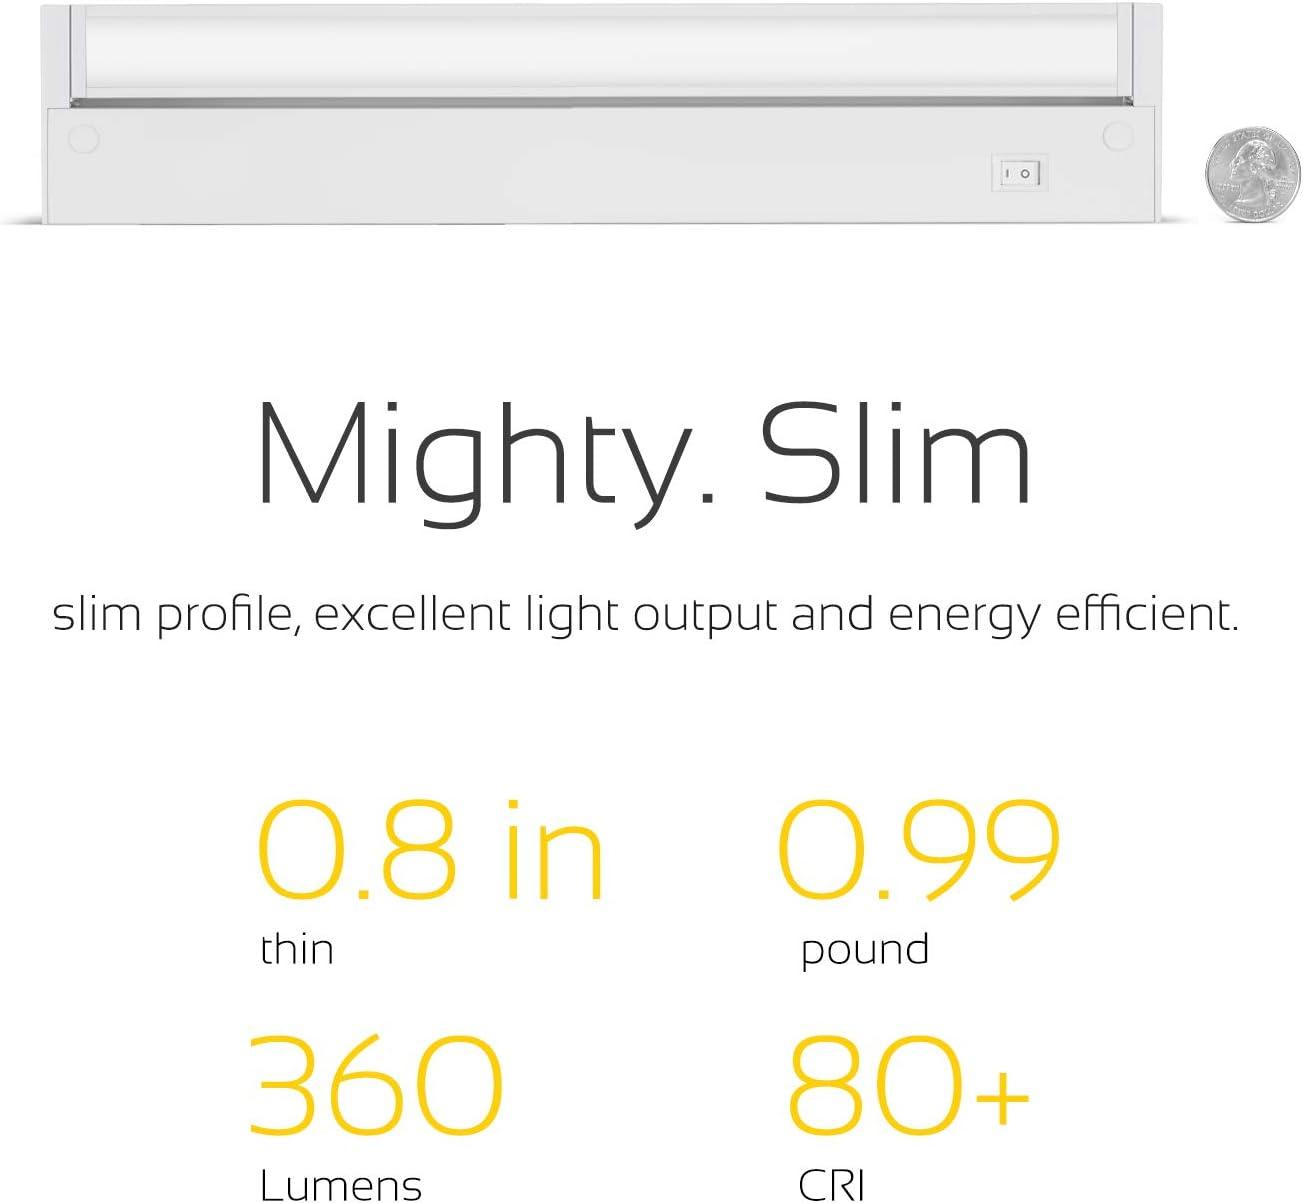 GetInLight Swivel LED Under Cabinet Lighting Fixture, ETL Listed, Ultra Slim Design, Soft White 3000K, White Finished. 12 Inch, IN-0108-2-WH 2nd Generation